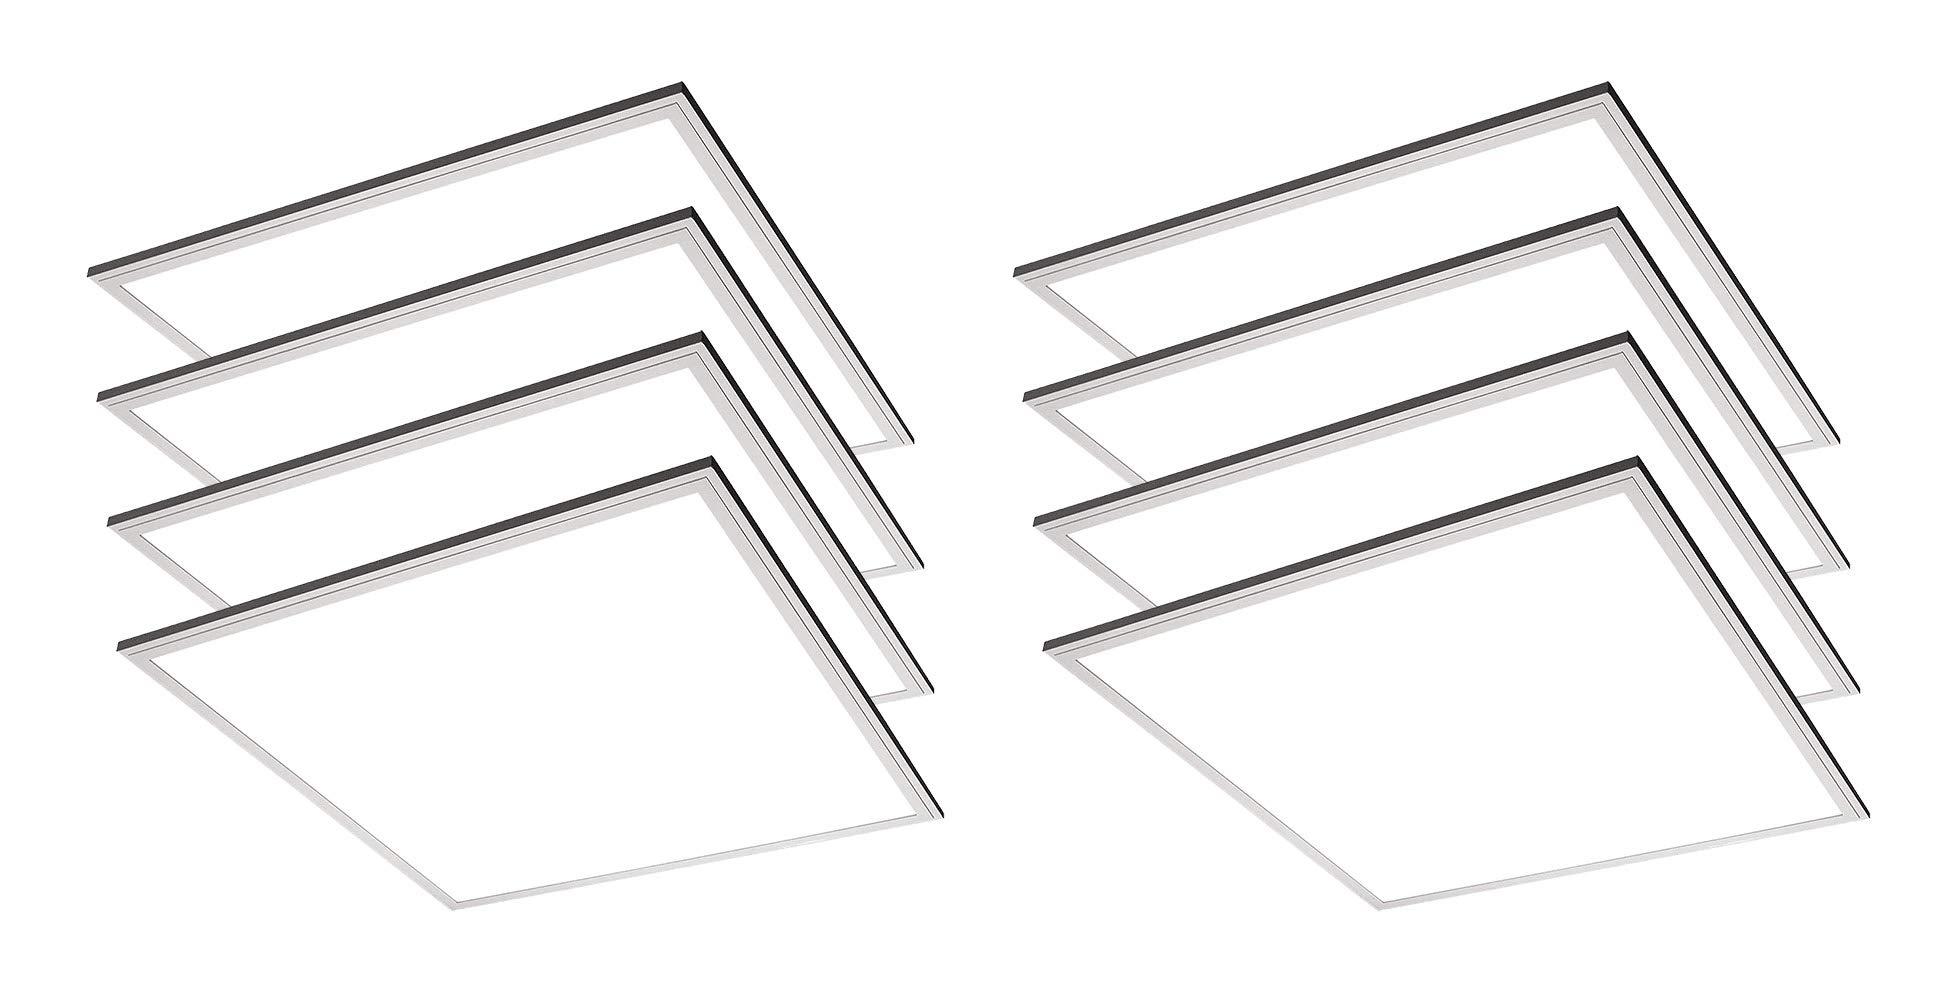 TCP 8 Pack 2x2 FT LED Flat Panel Light Fixture, 36W - 3600 Lumens, 5000K Daylight, 110V-277V, 0-10V Dimming by TC (Image #1)